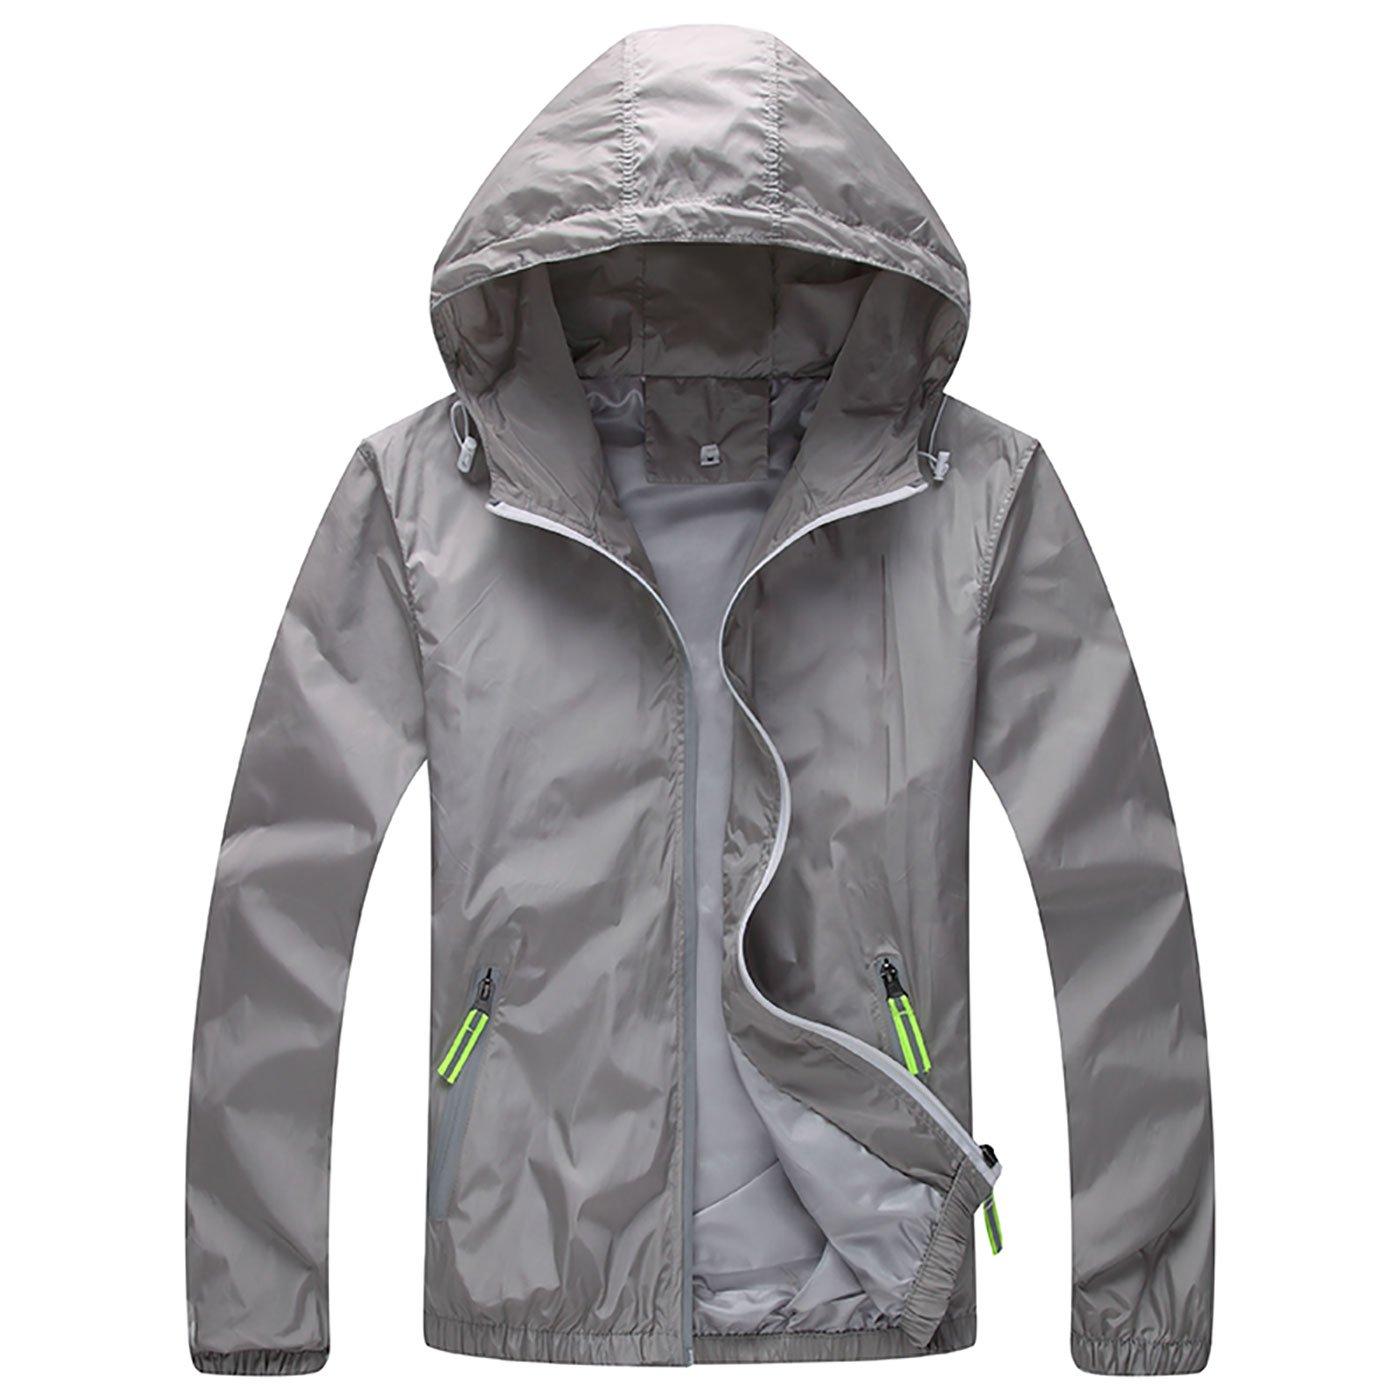 Panegy Women's Windproof Jacket Men's Outerwear Windproof Waterproof Running Casual Lightweight Grey XL by Panegy